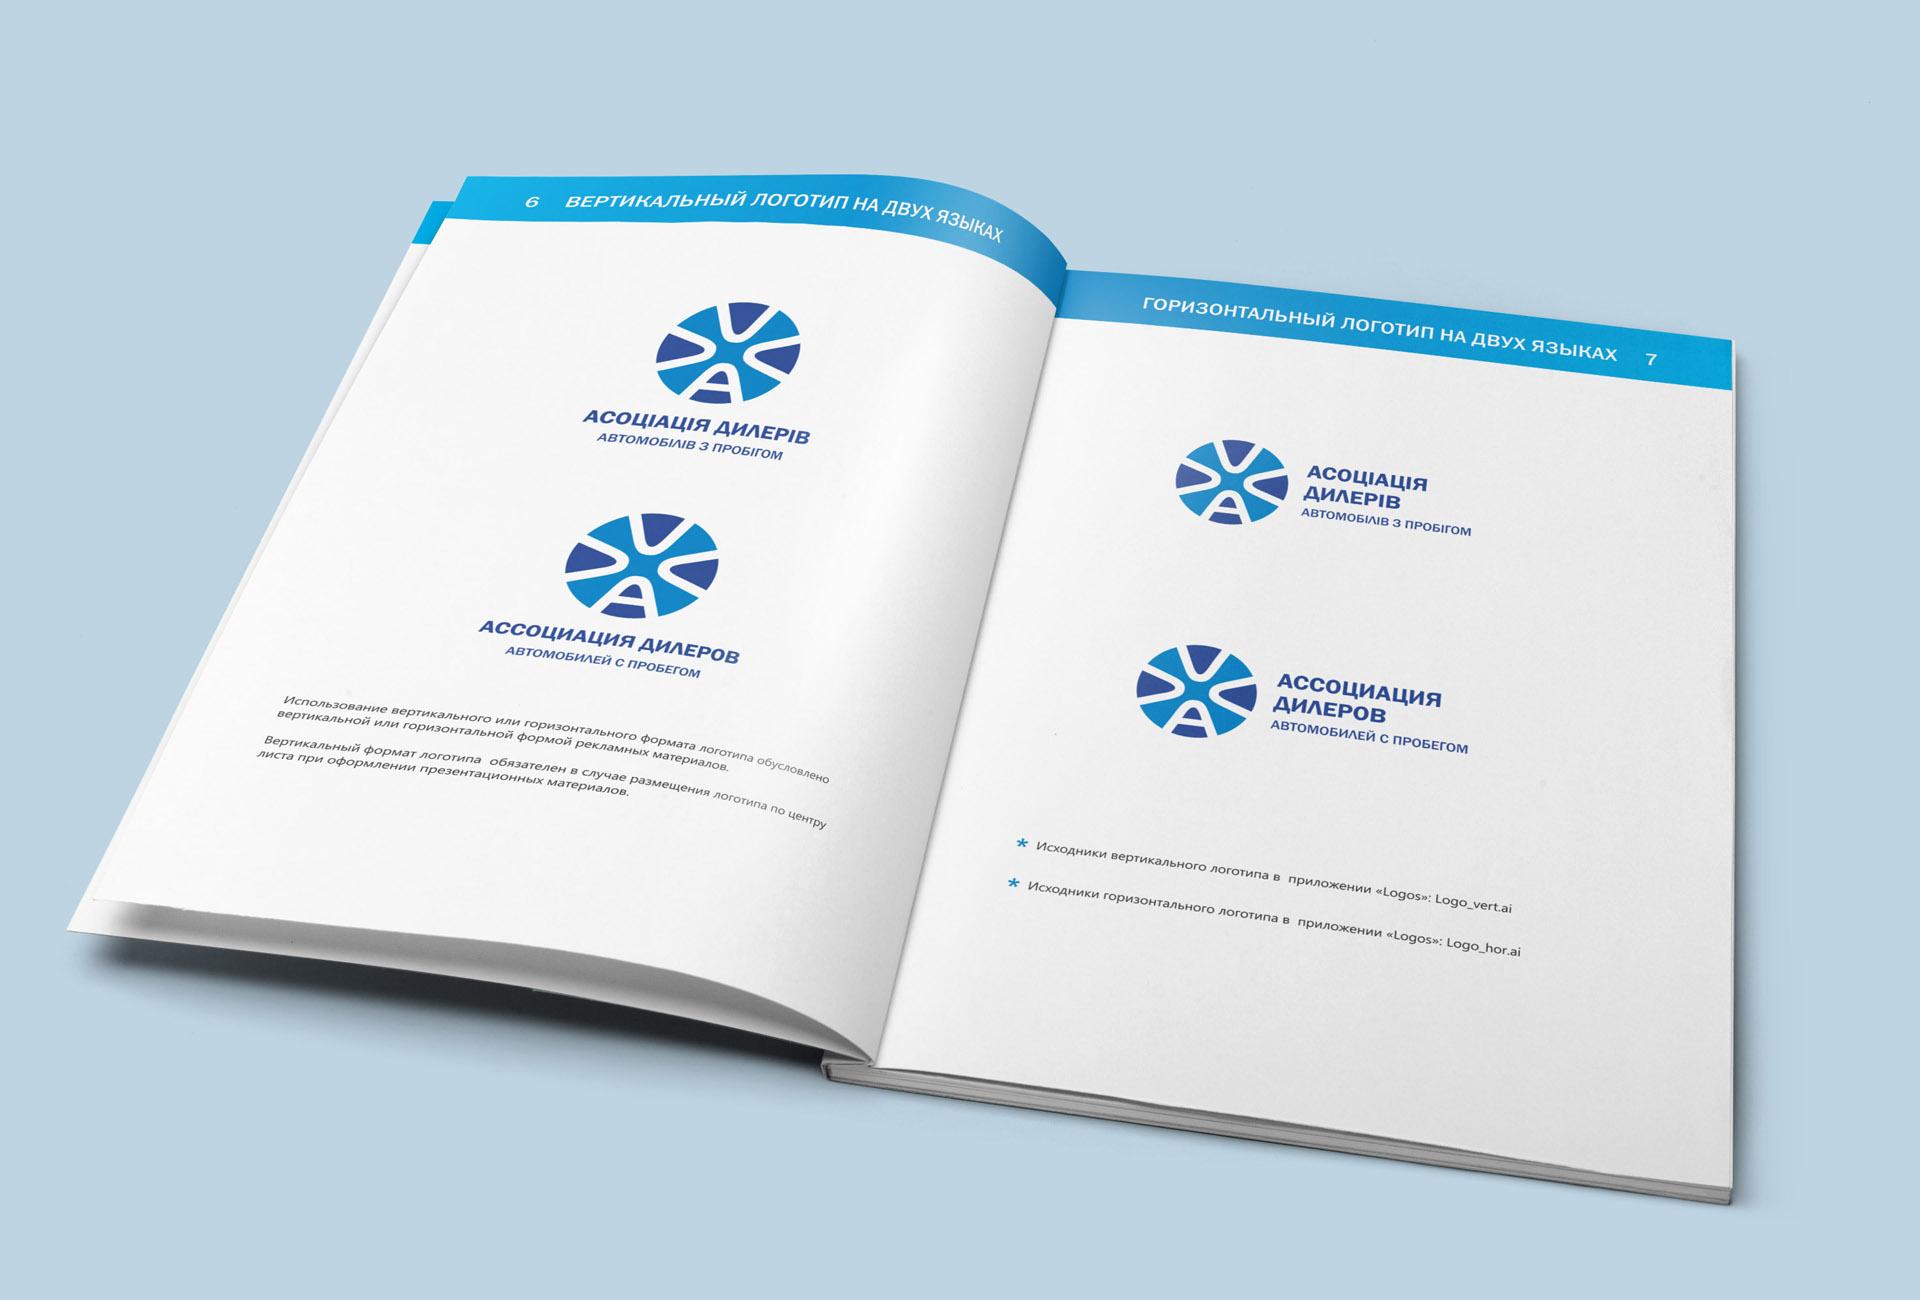 brand book of the car company. Разработка логотипа